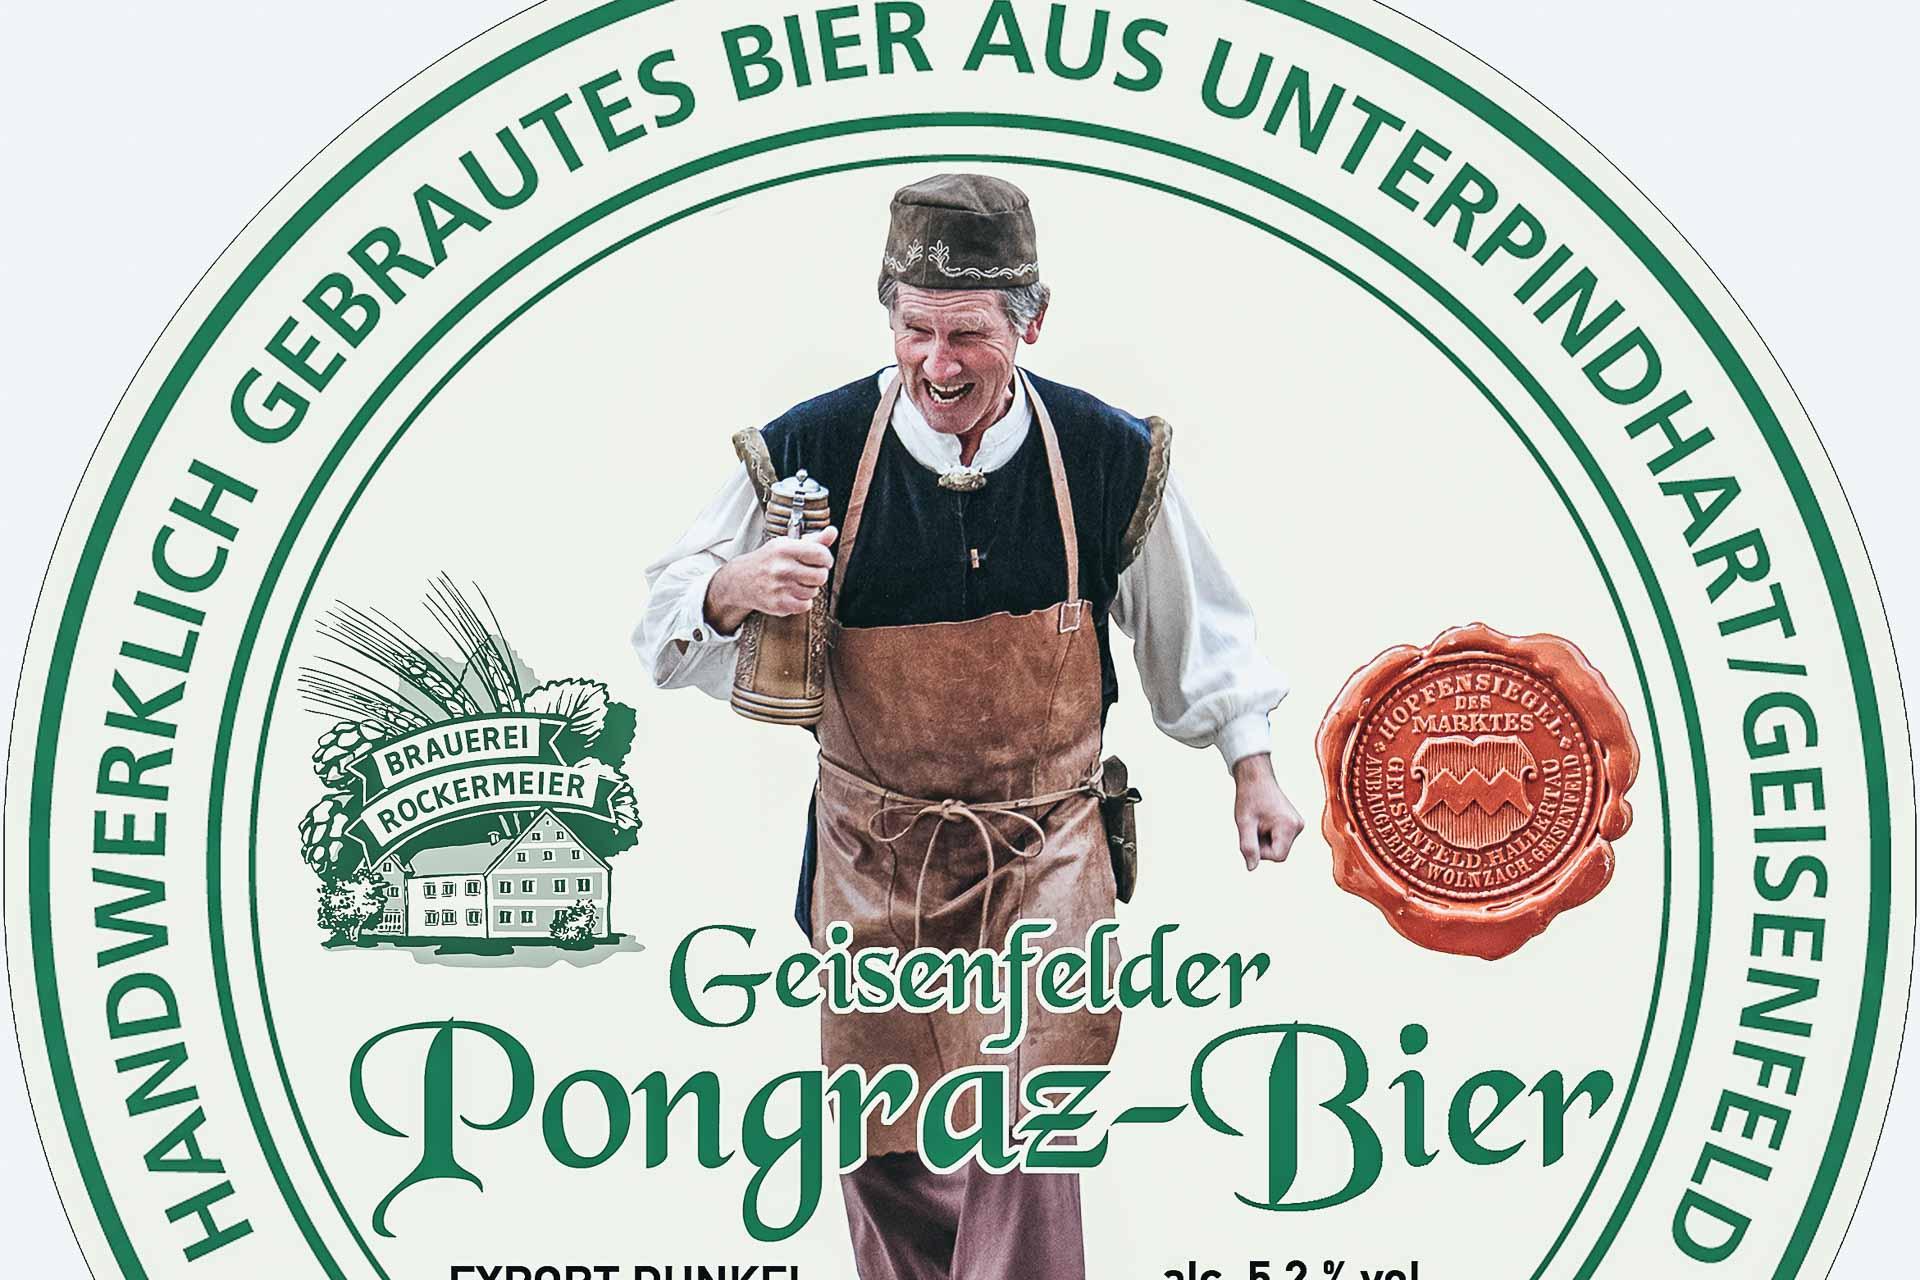 Hallertau Insider - Geisenfeld